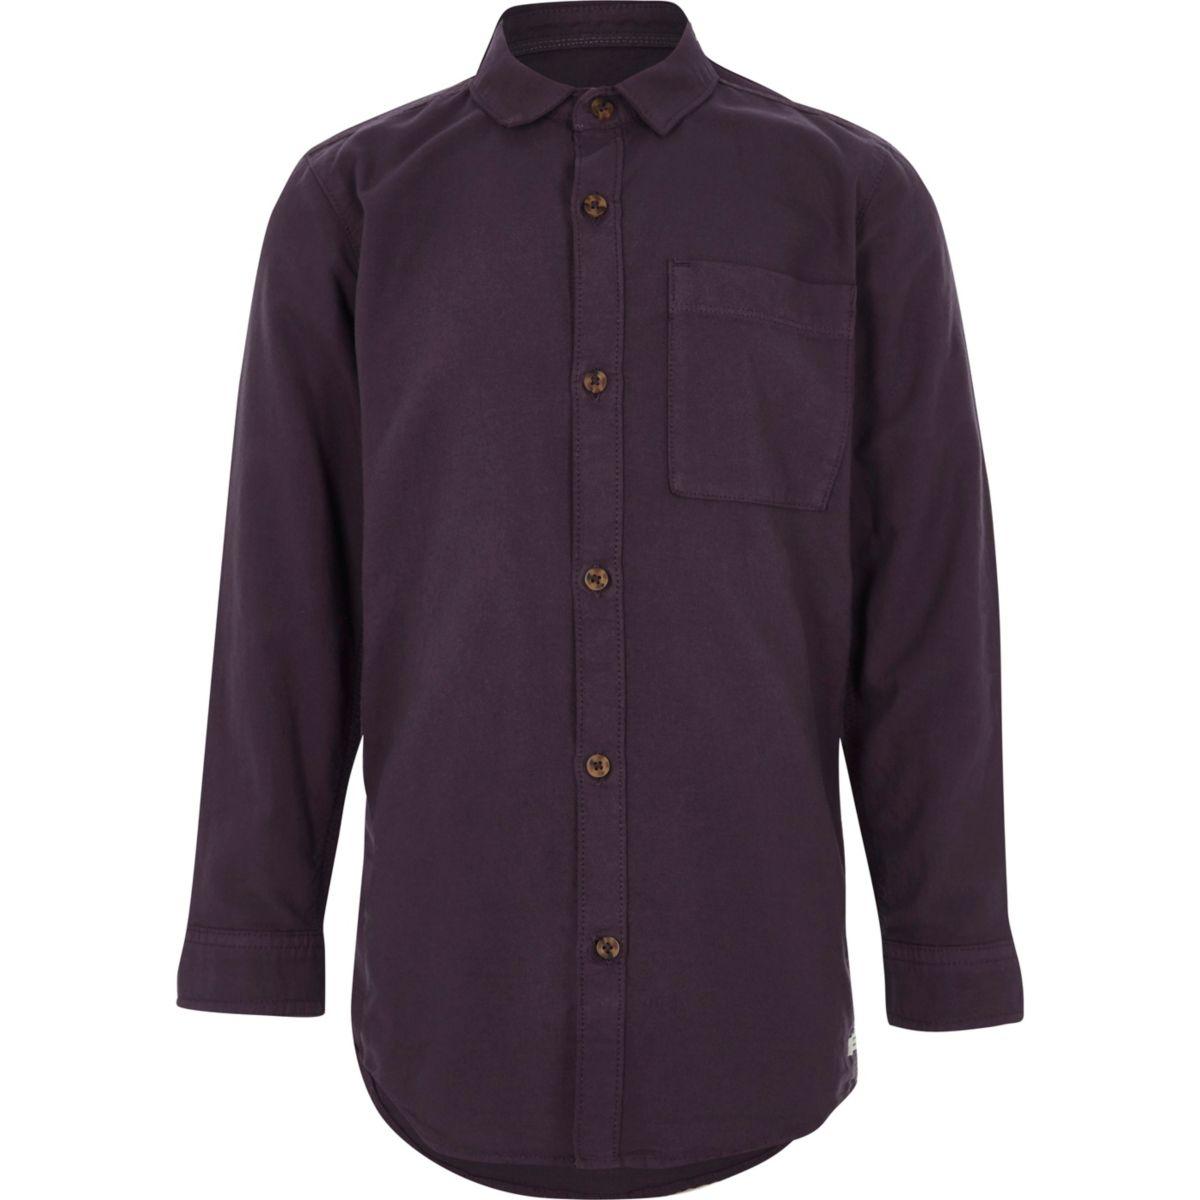 Boys purple long sleeve Oxford shirt